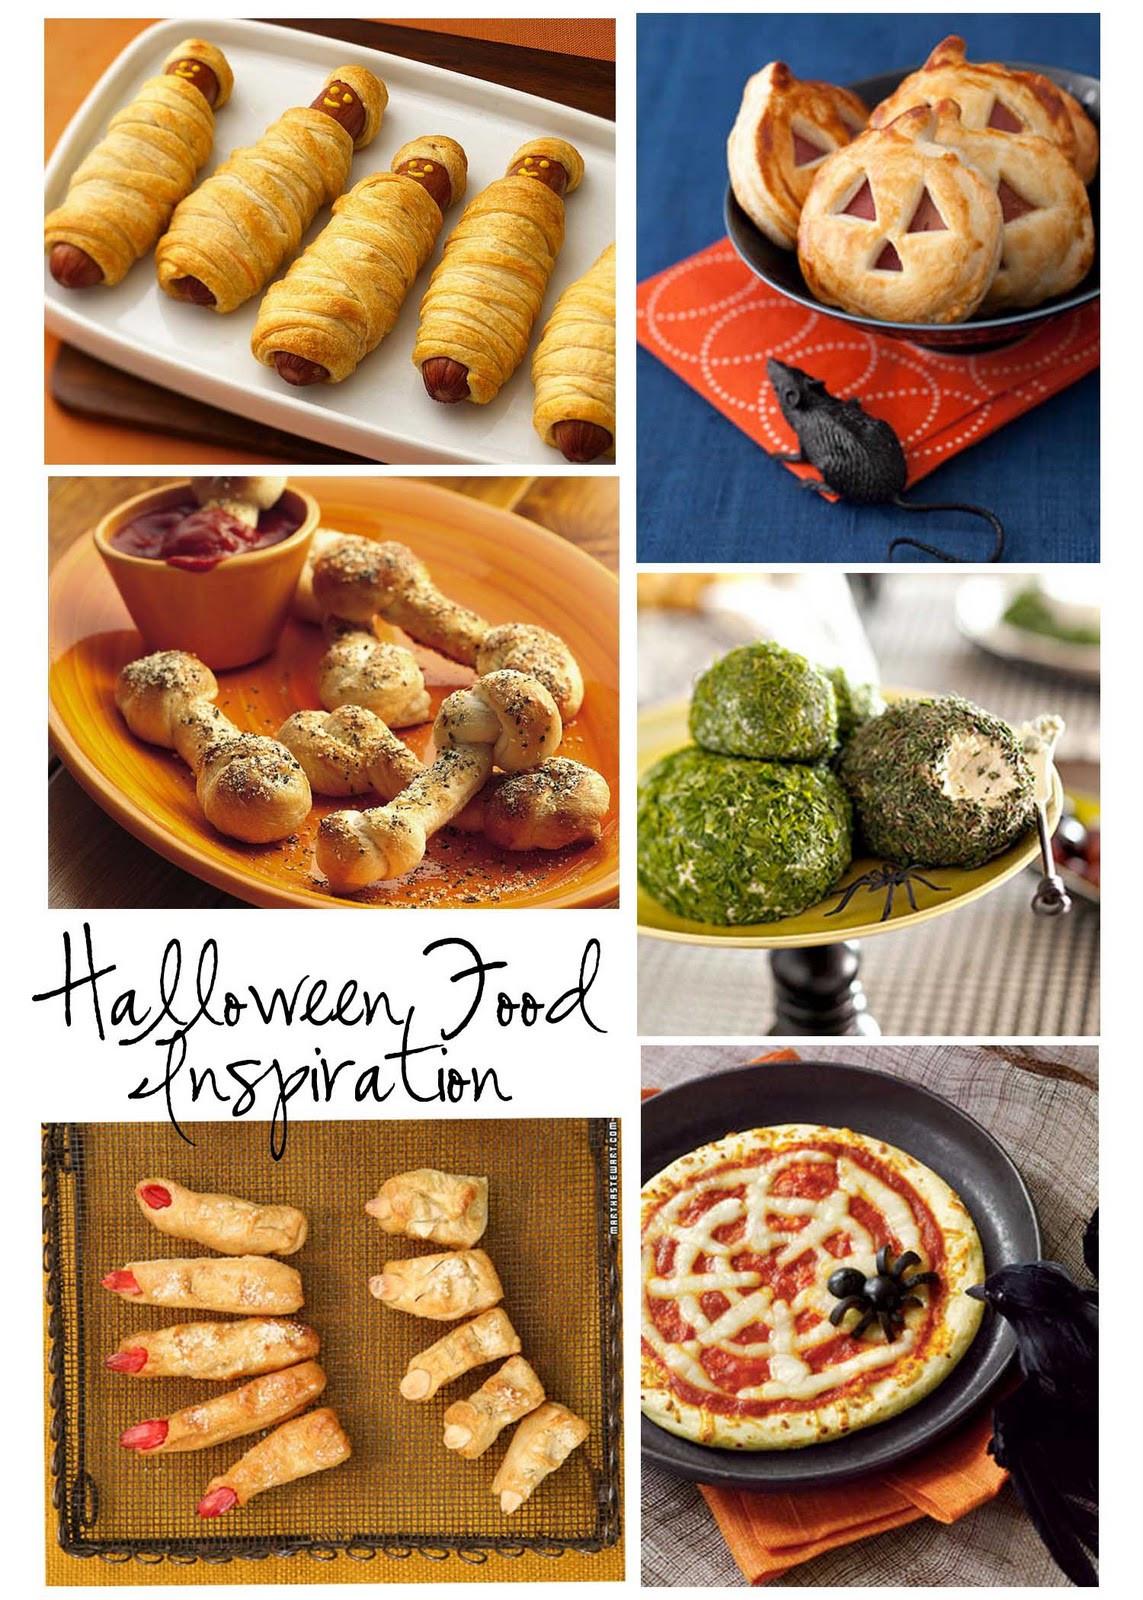 Halloween Kids Party Food Ideas  Room to Inspire Spooky Food Ideas